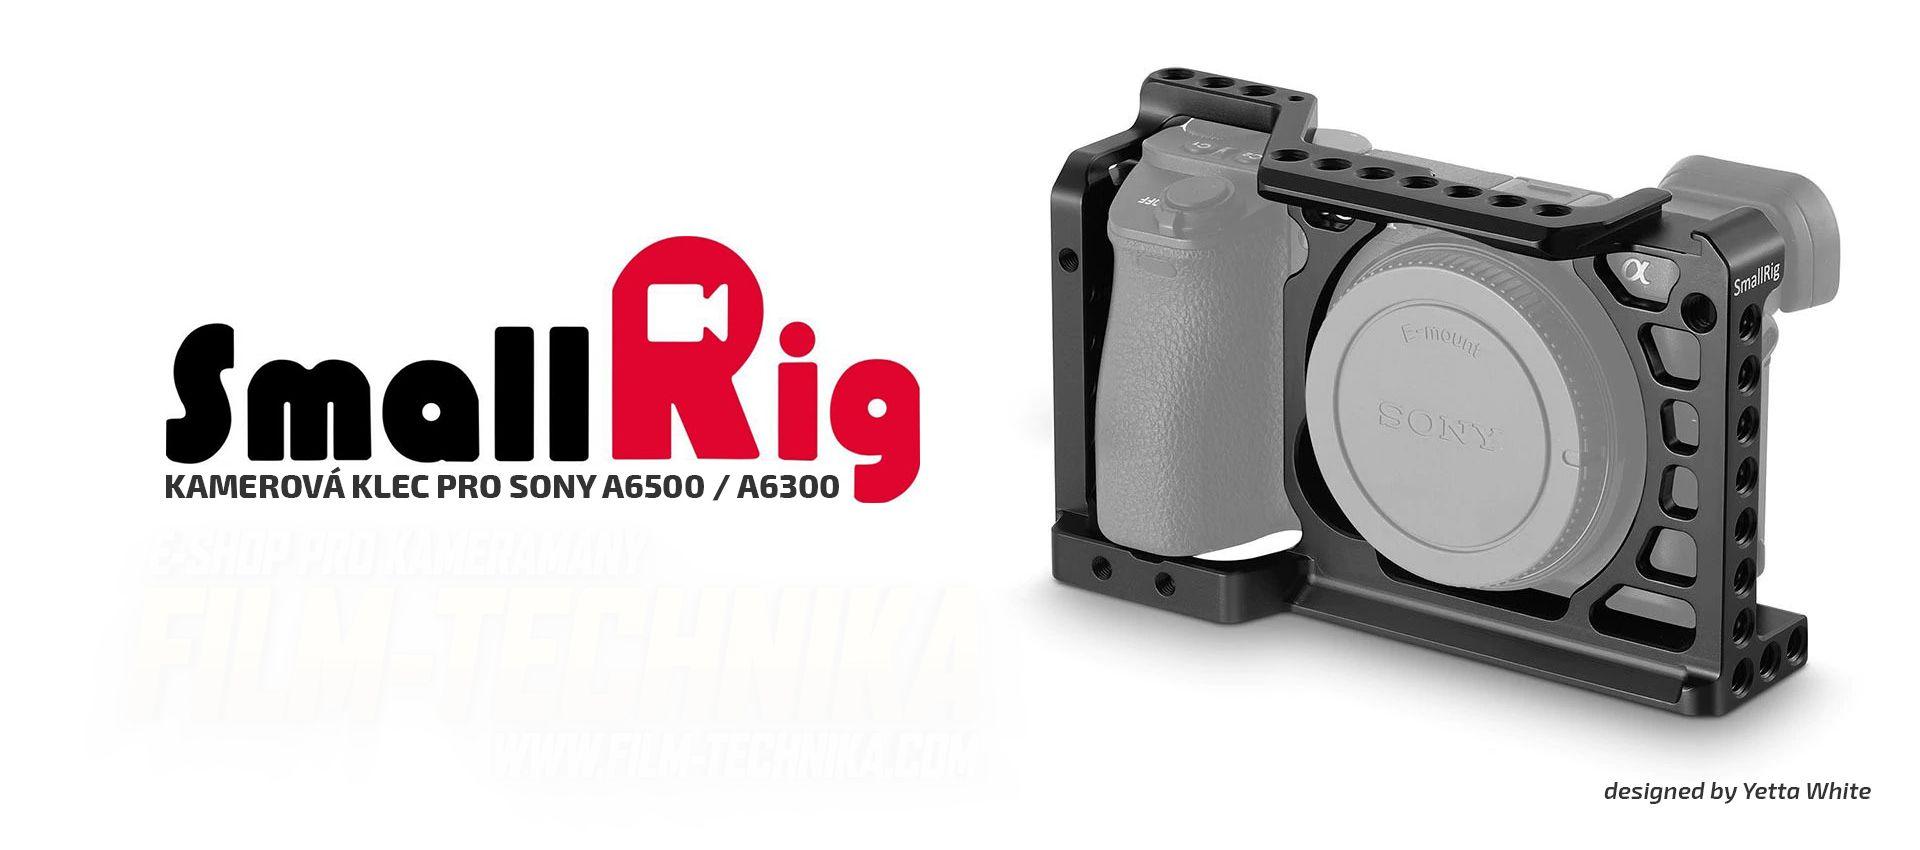 film-technika-smallrog-a5000-klec-intext3